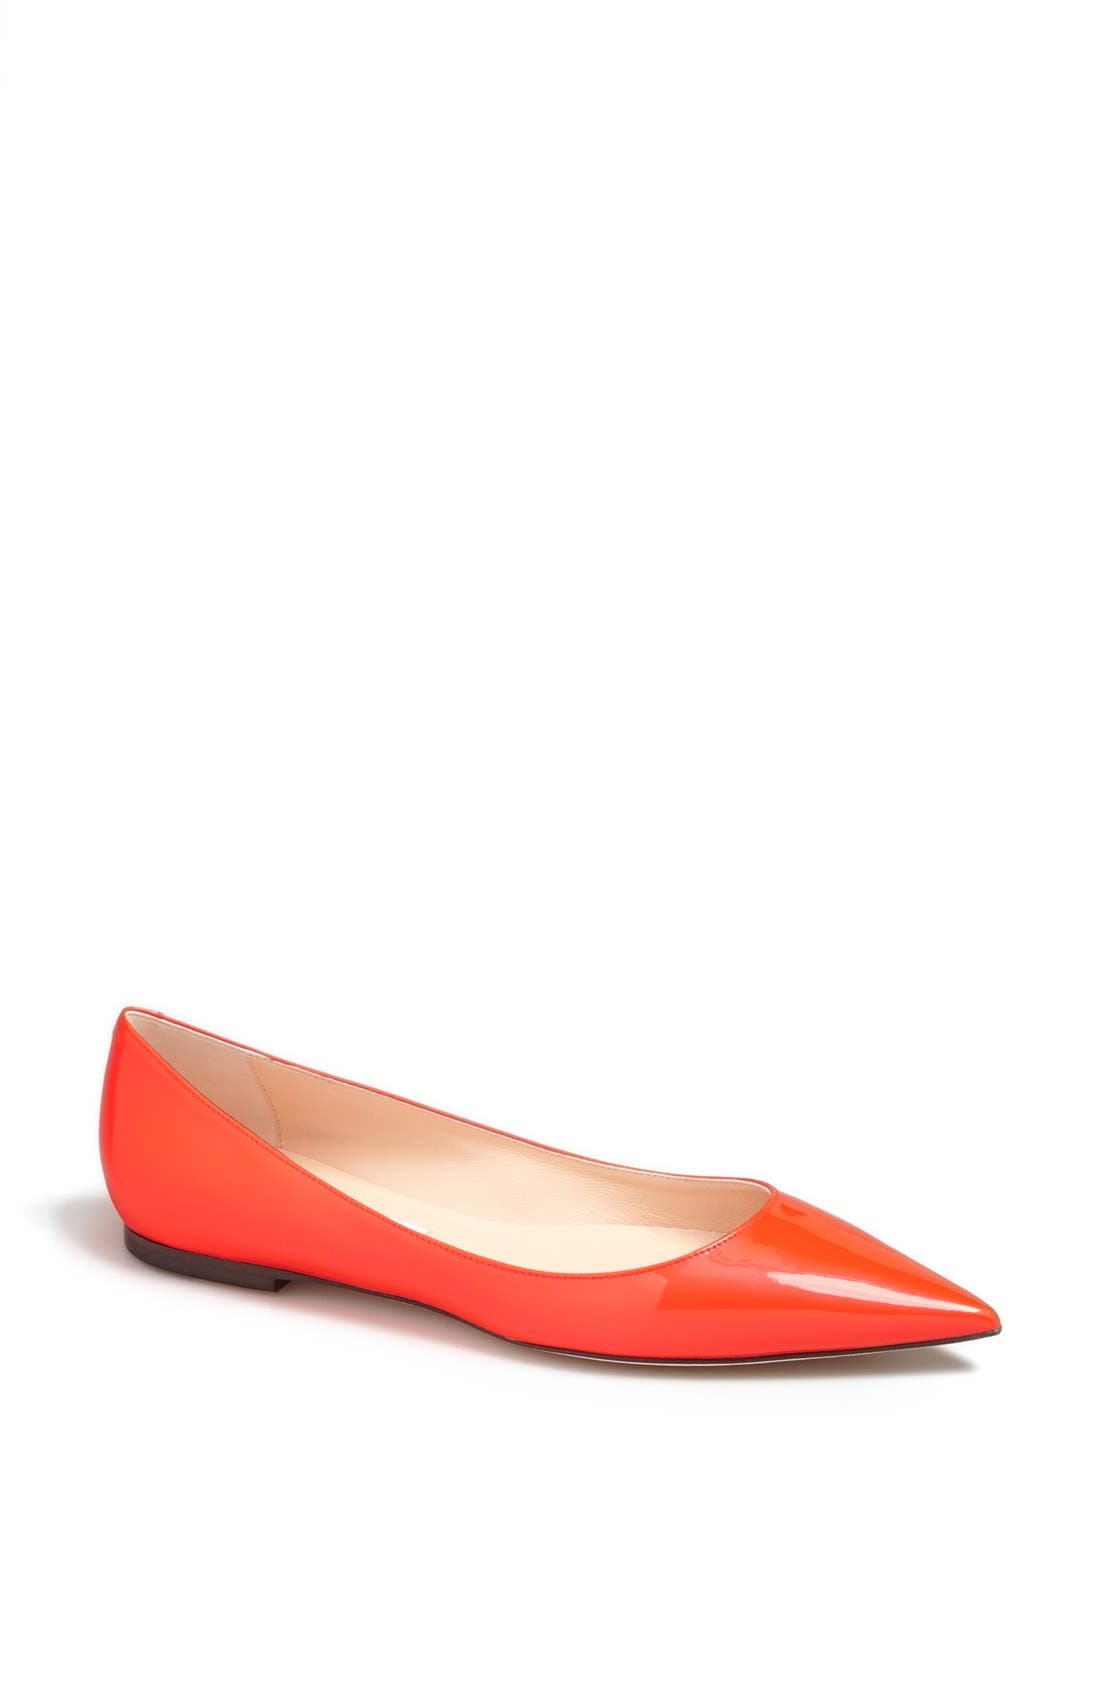 Alternate Image 1 Selected - Jimmy Choo 'Alina' Pointy Toe Flat